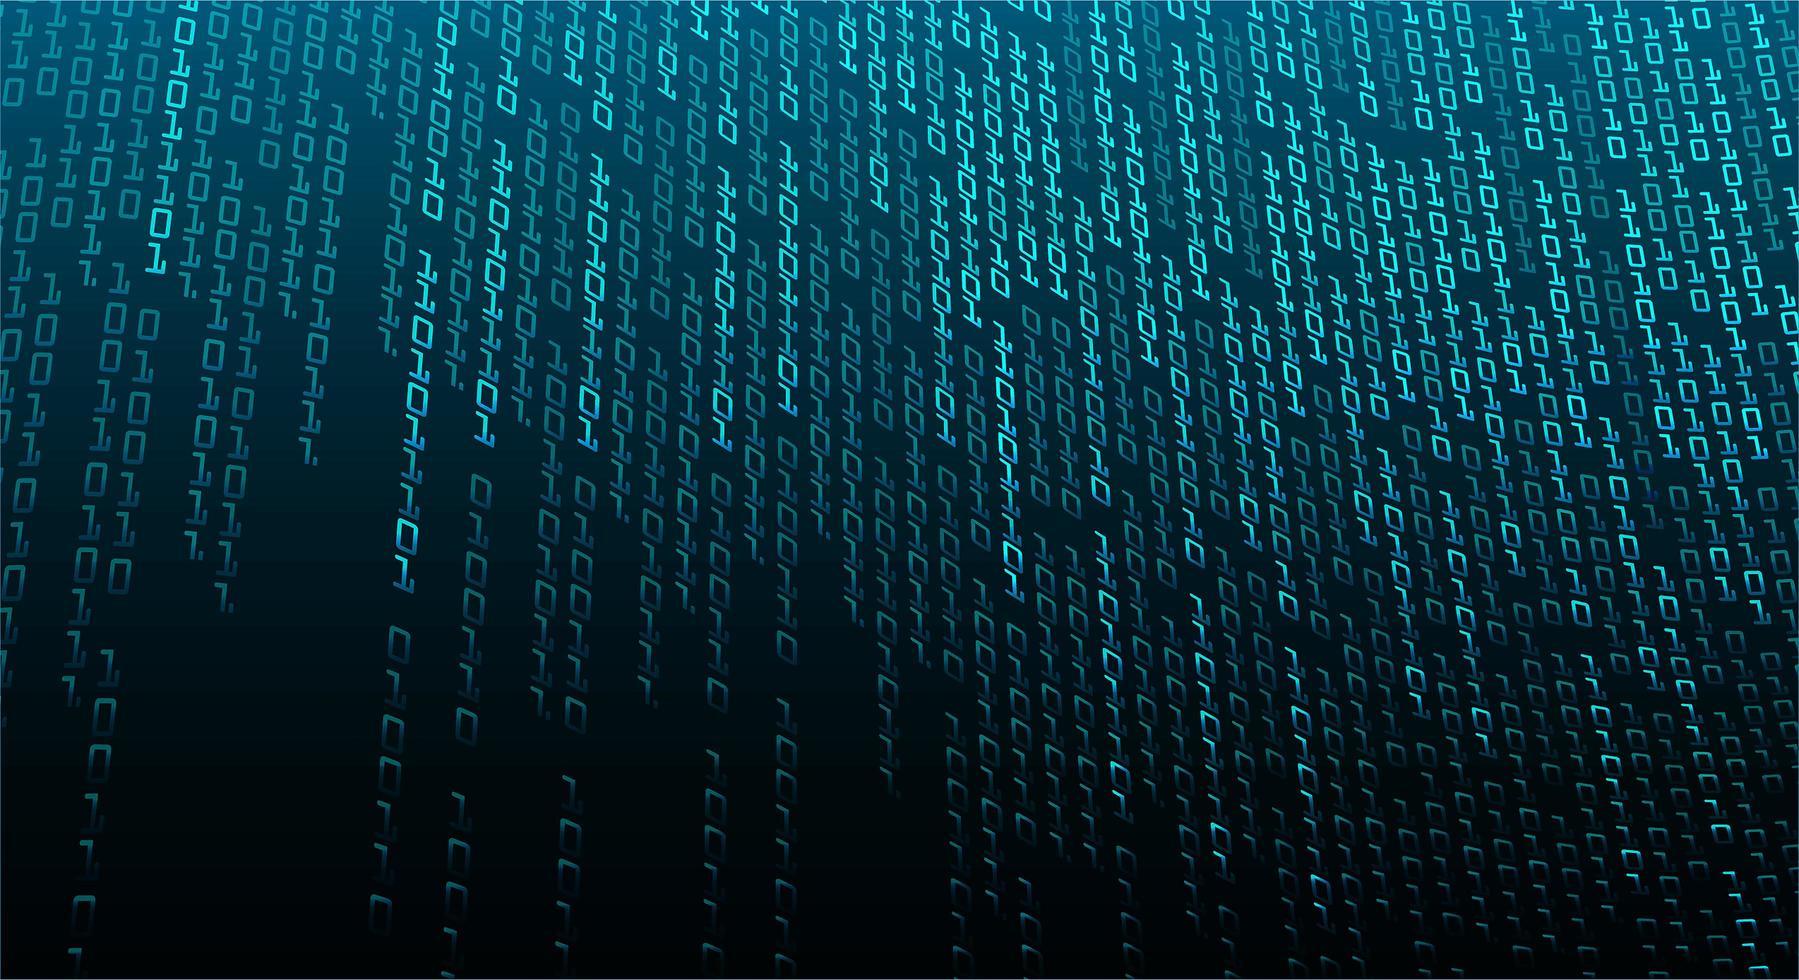 fond de technologie future cyber circuit binaire bleu vecteur